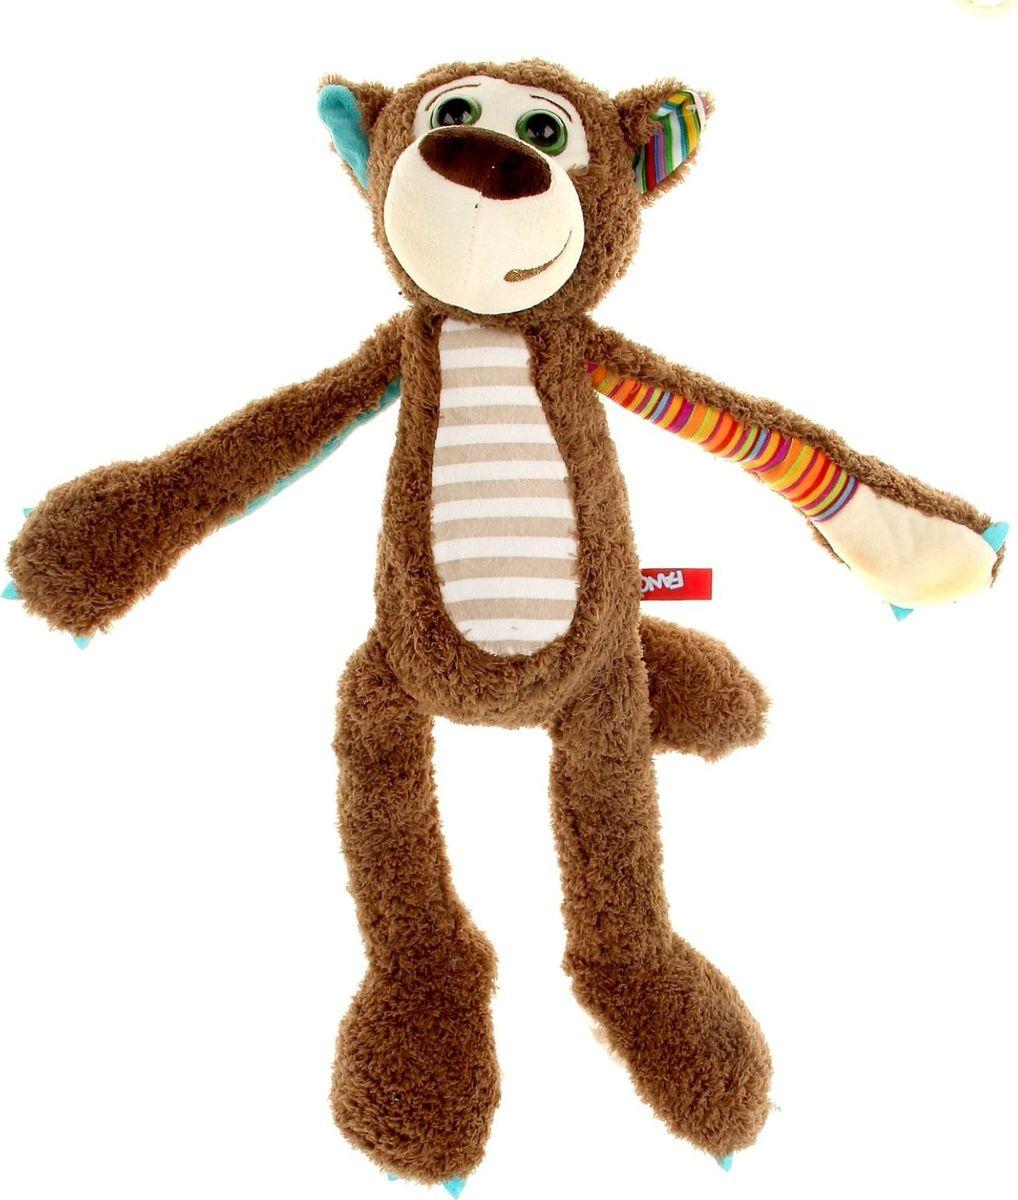 Sima-land Мягкая игрушка Волчонок 54 см sima land мягкая игрушка сердце 309576